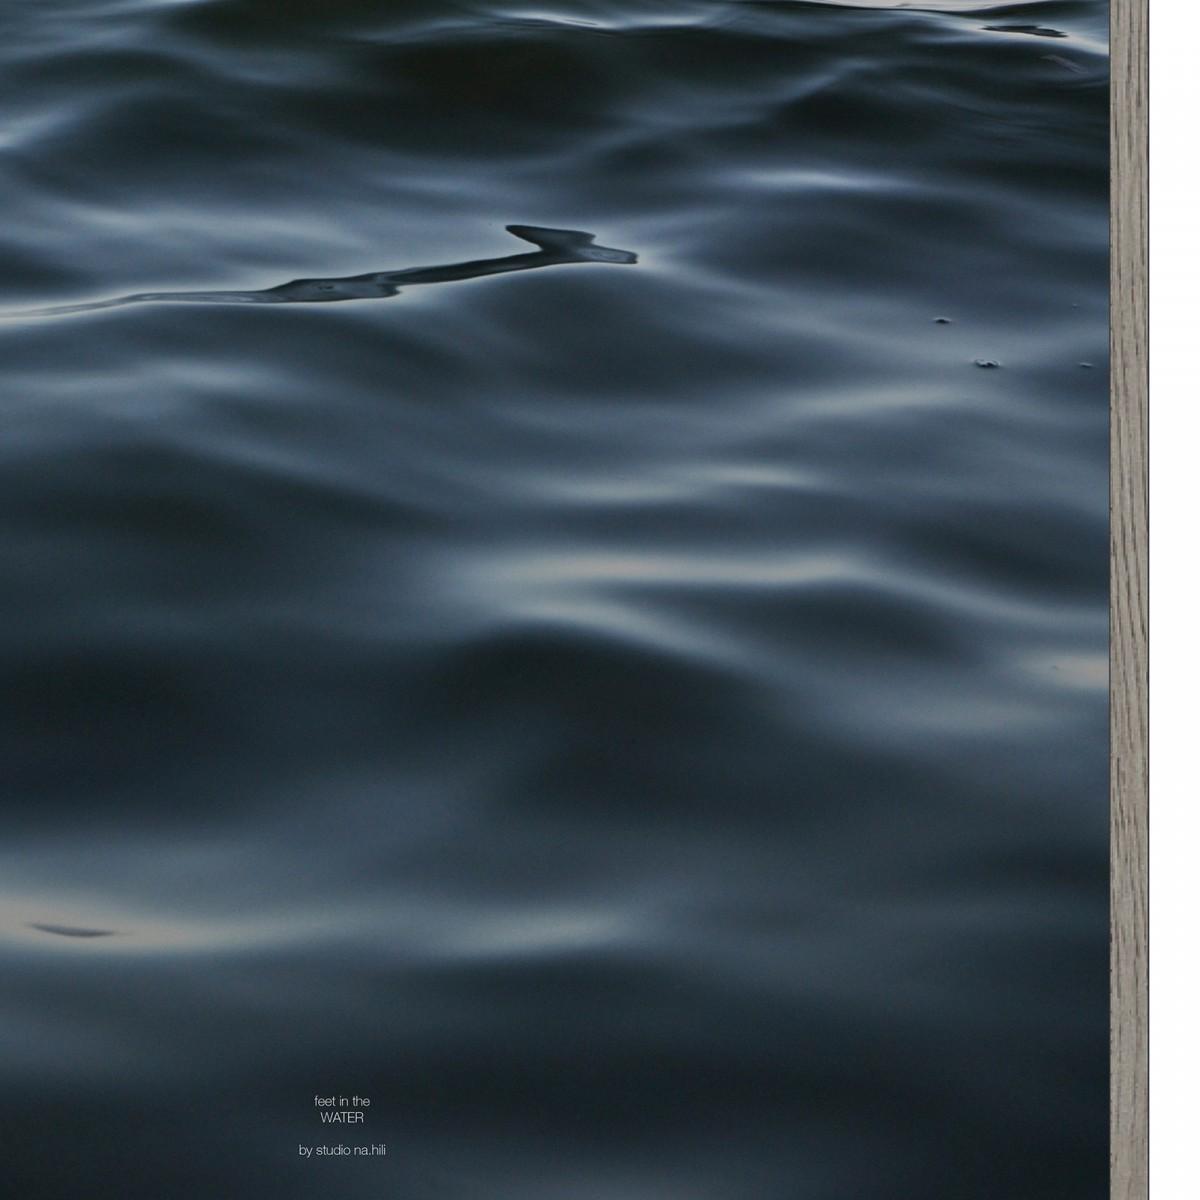 feet in the WATER - A1 Artprint - Poster